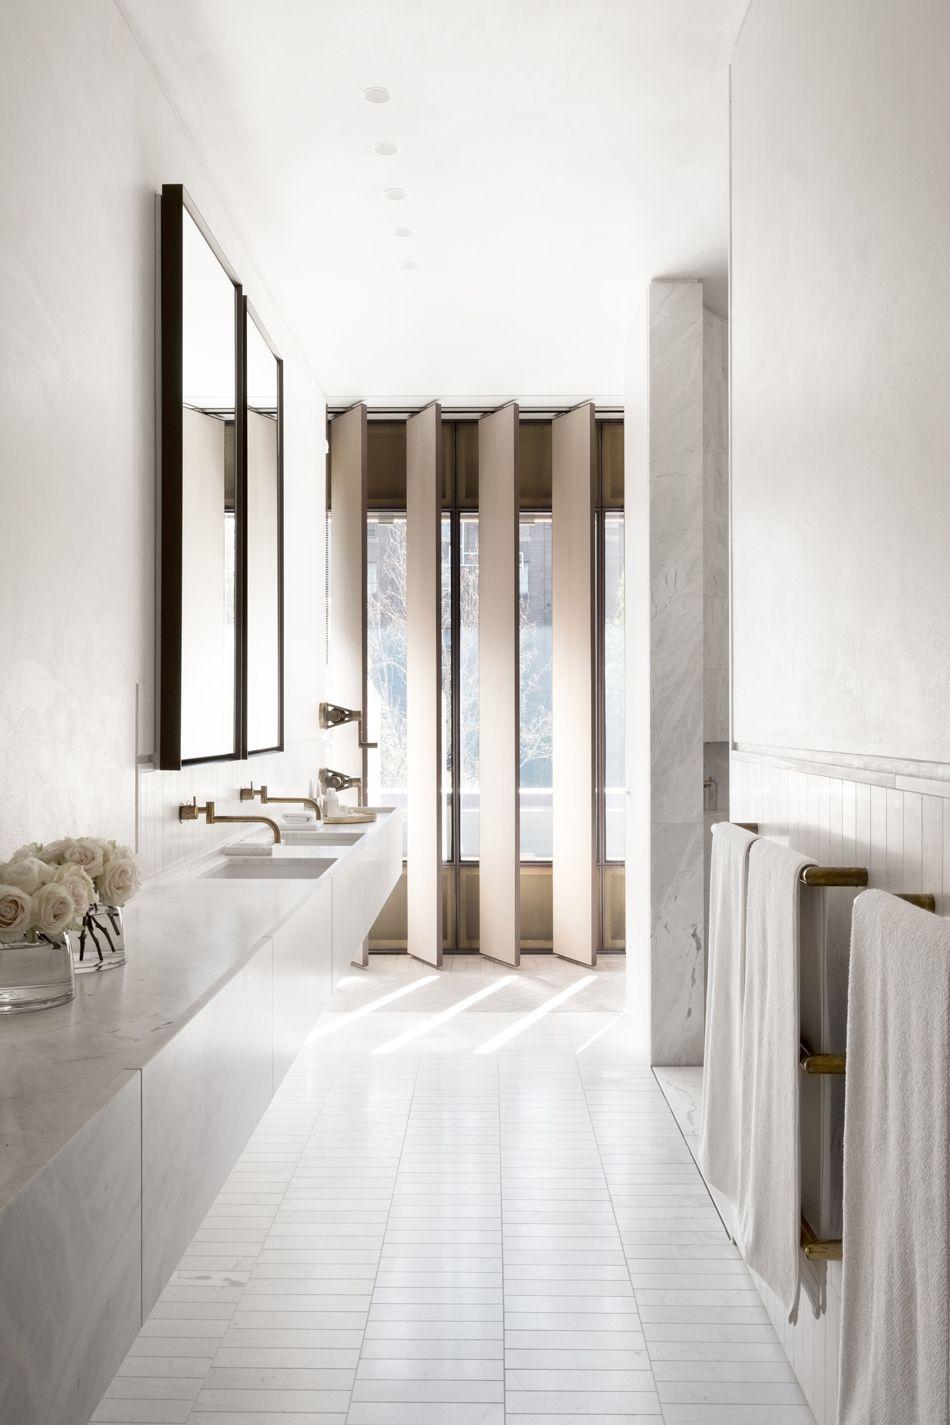 Bathroom Design Eastbourne best residential bathroom design william smart indigo slam | bathe